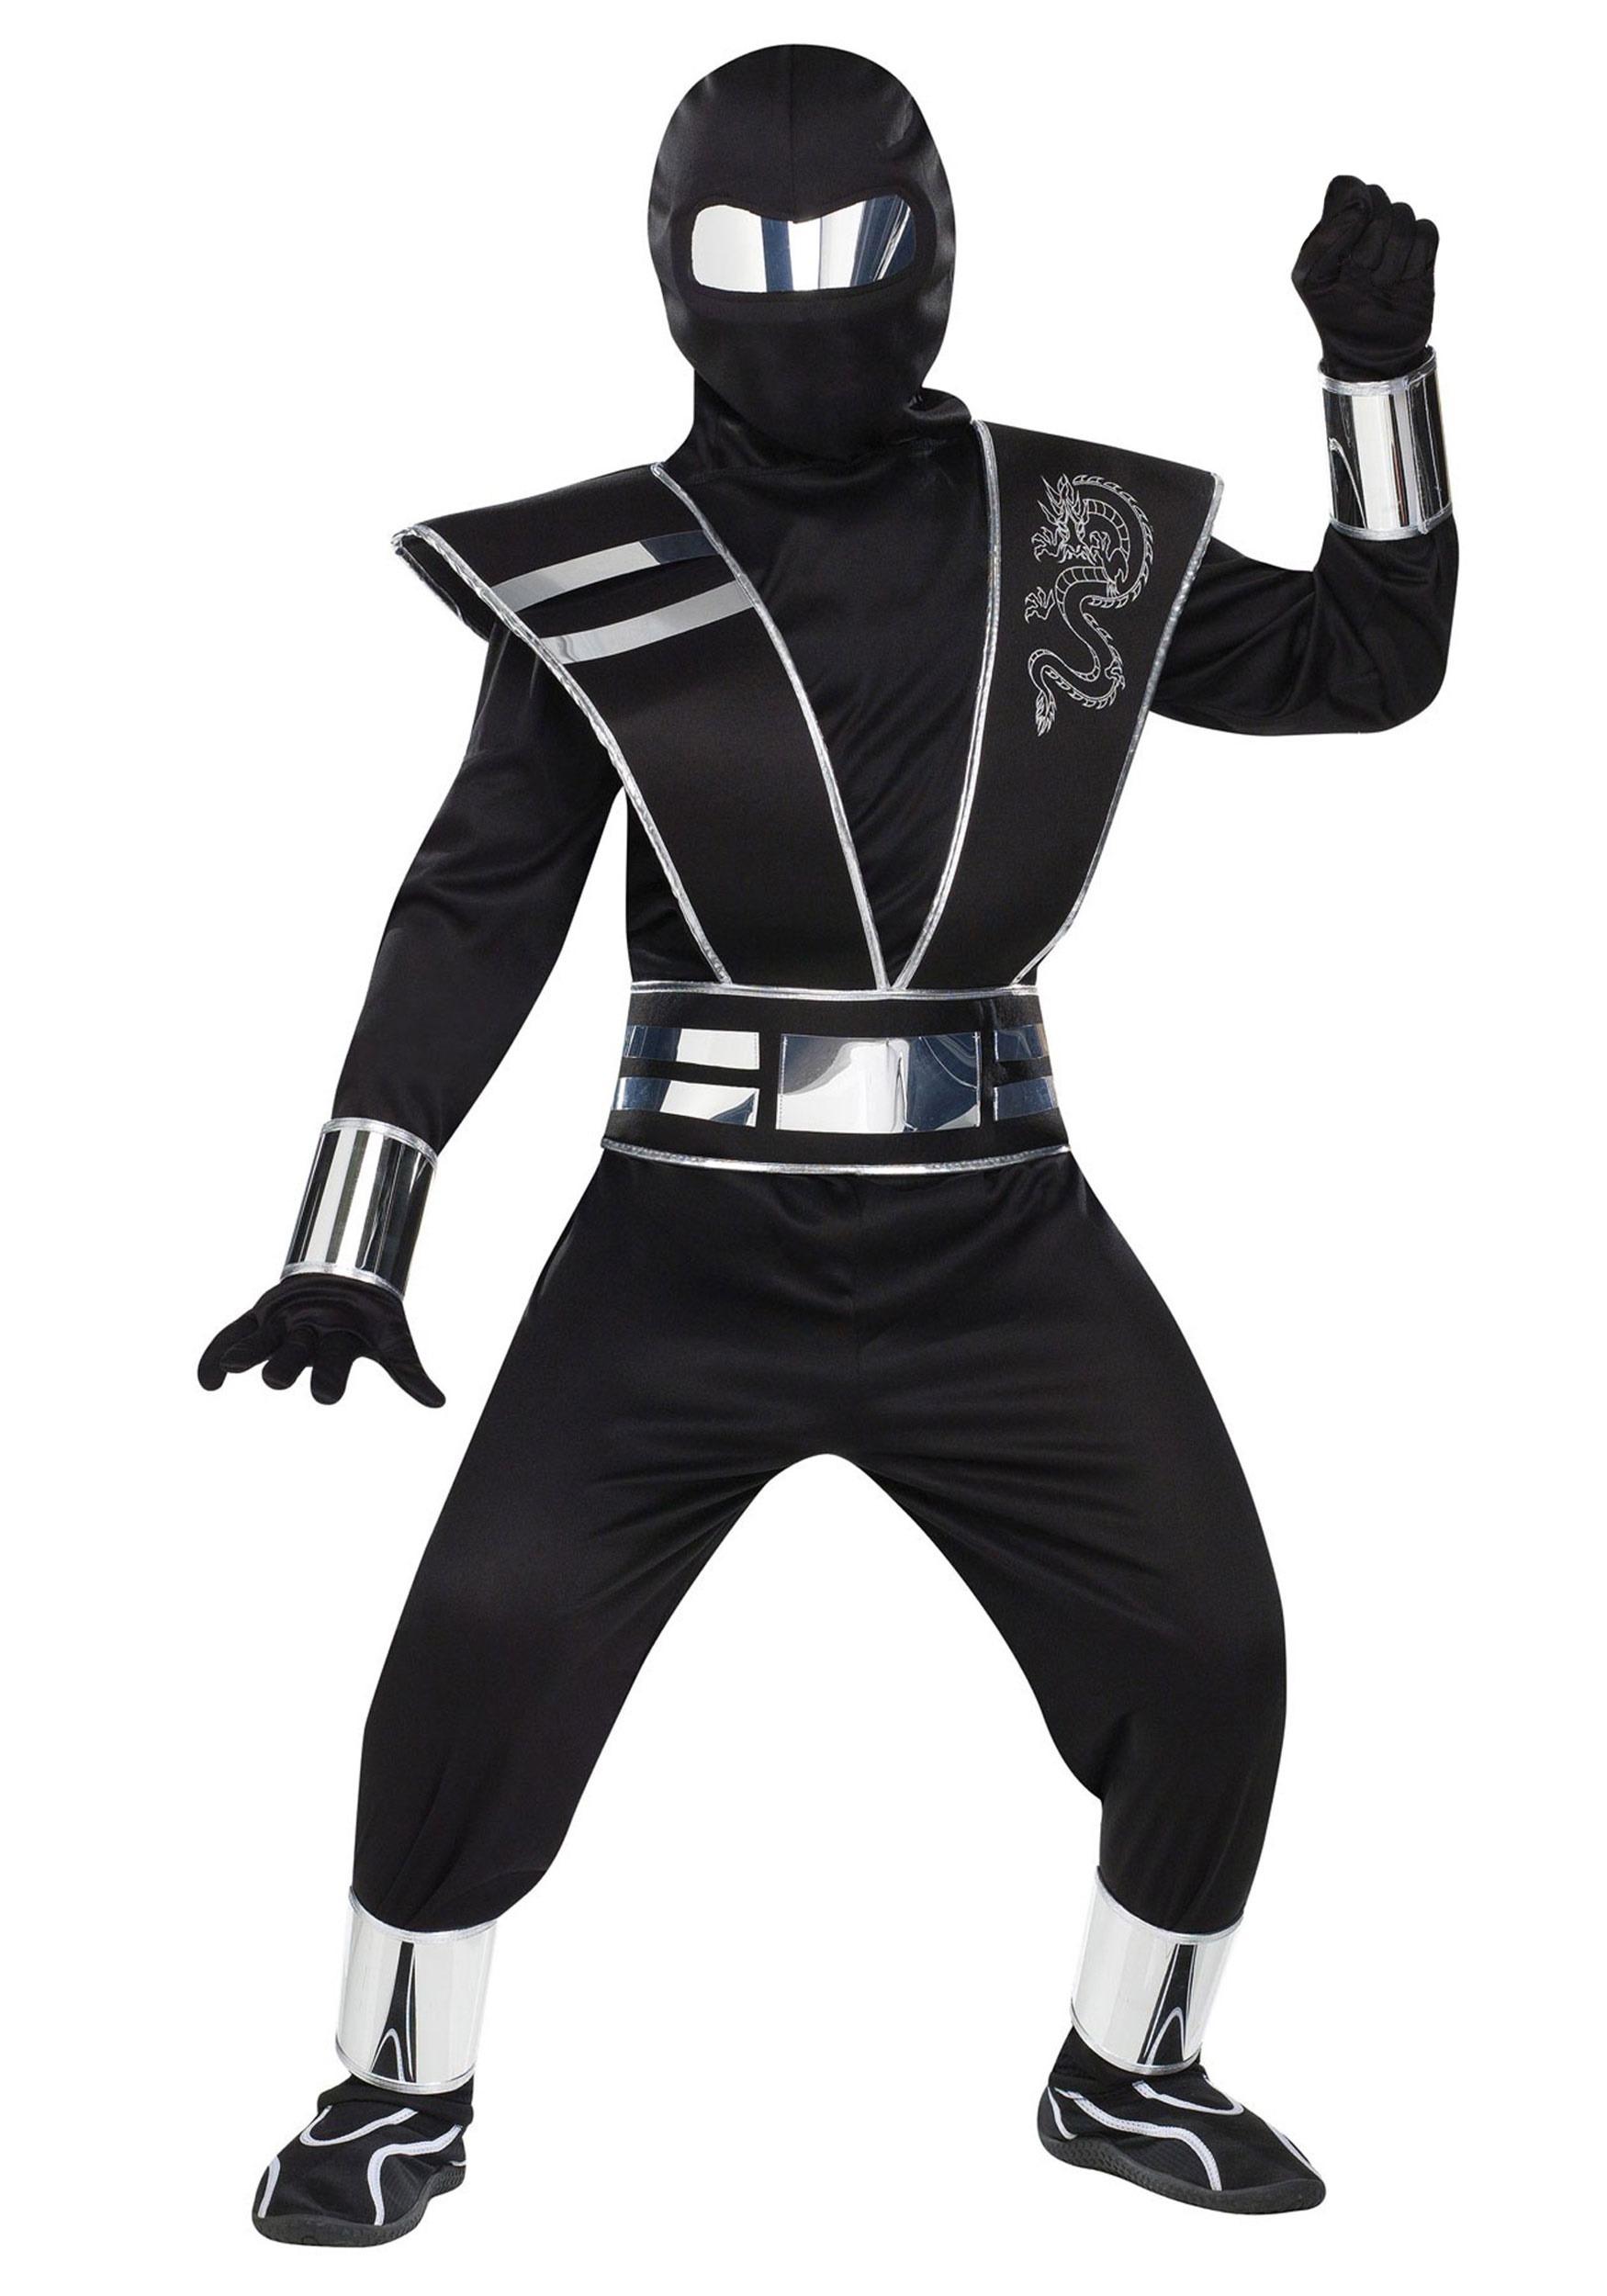 Silver Mirror Ninja Costume for Kids